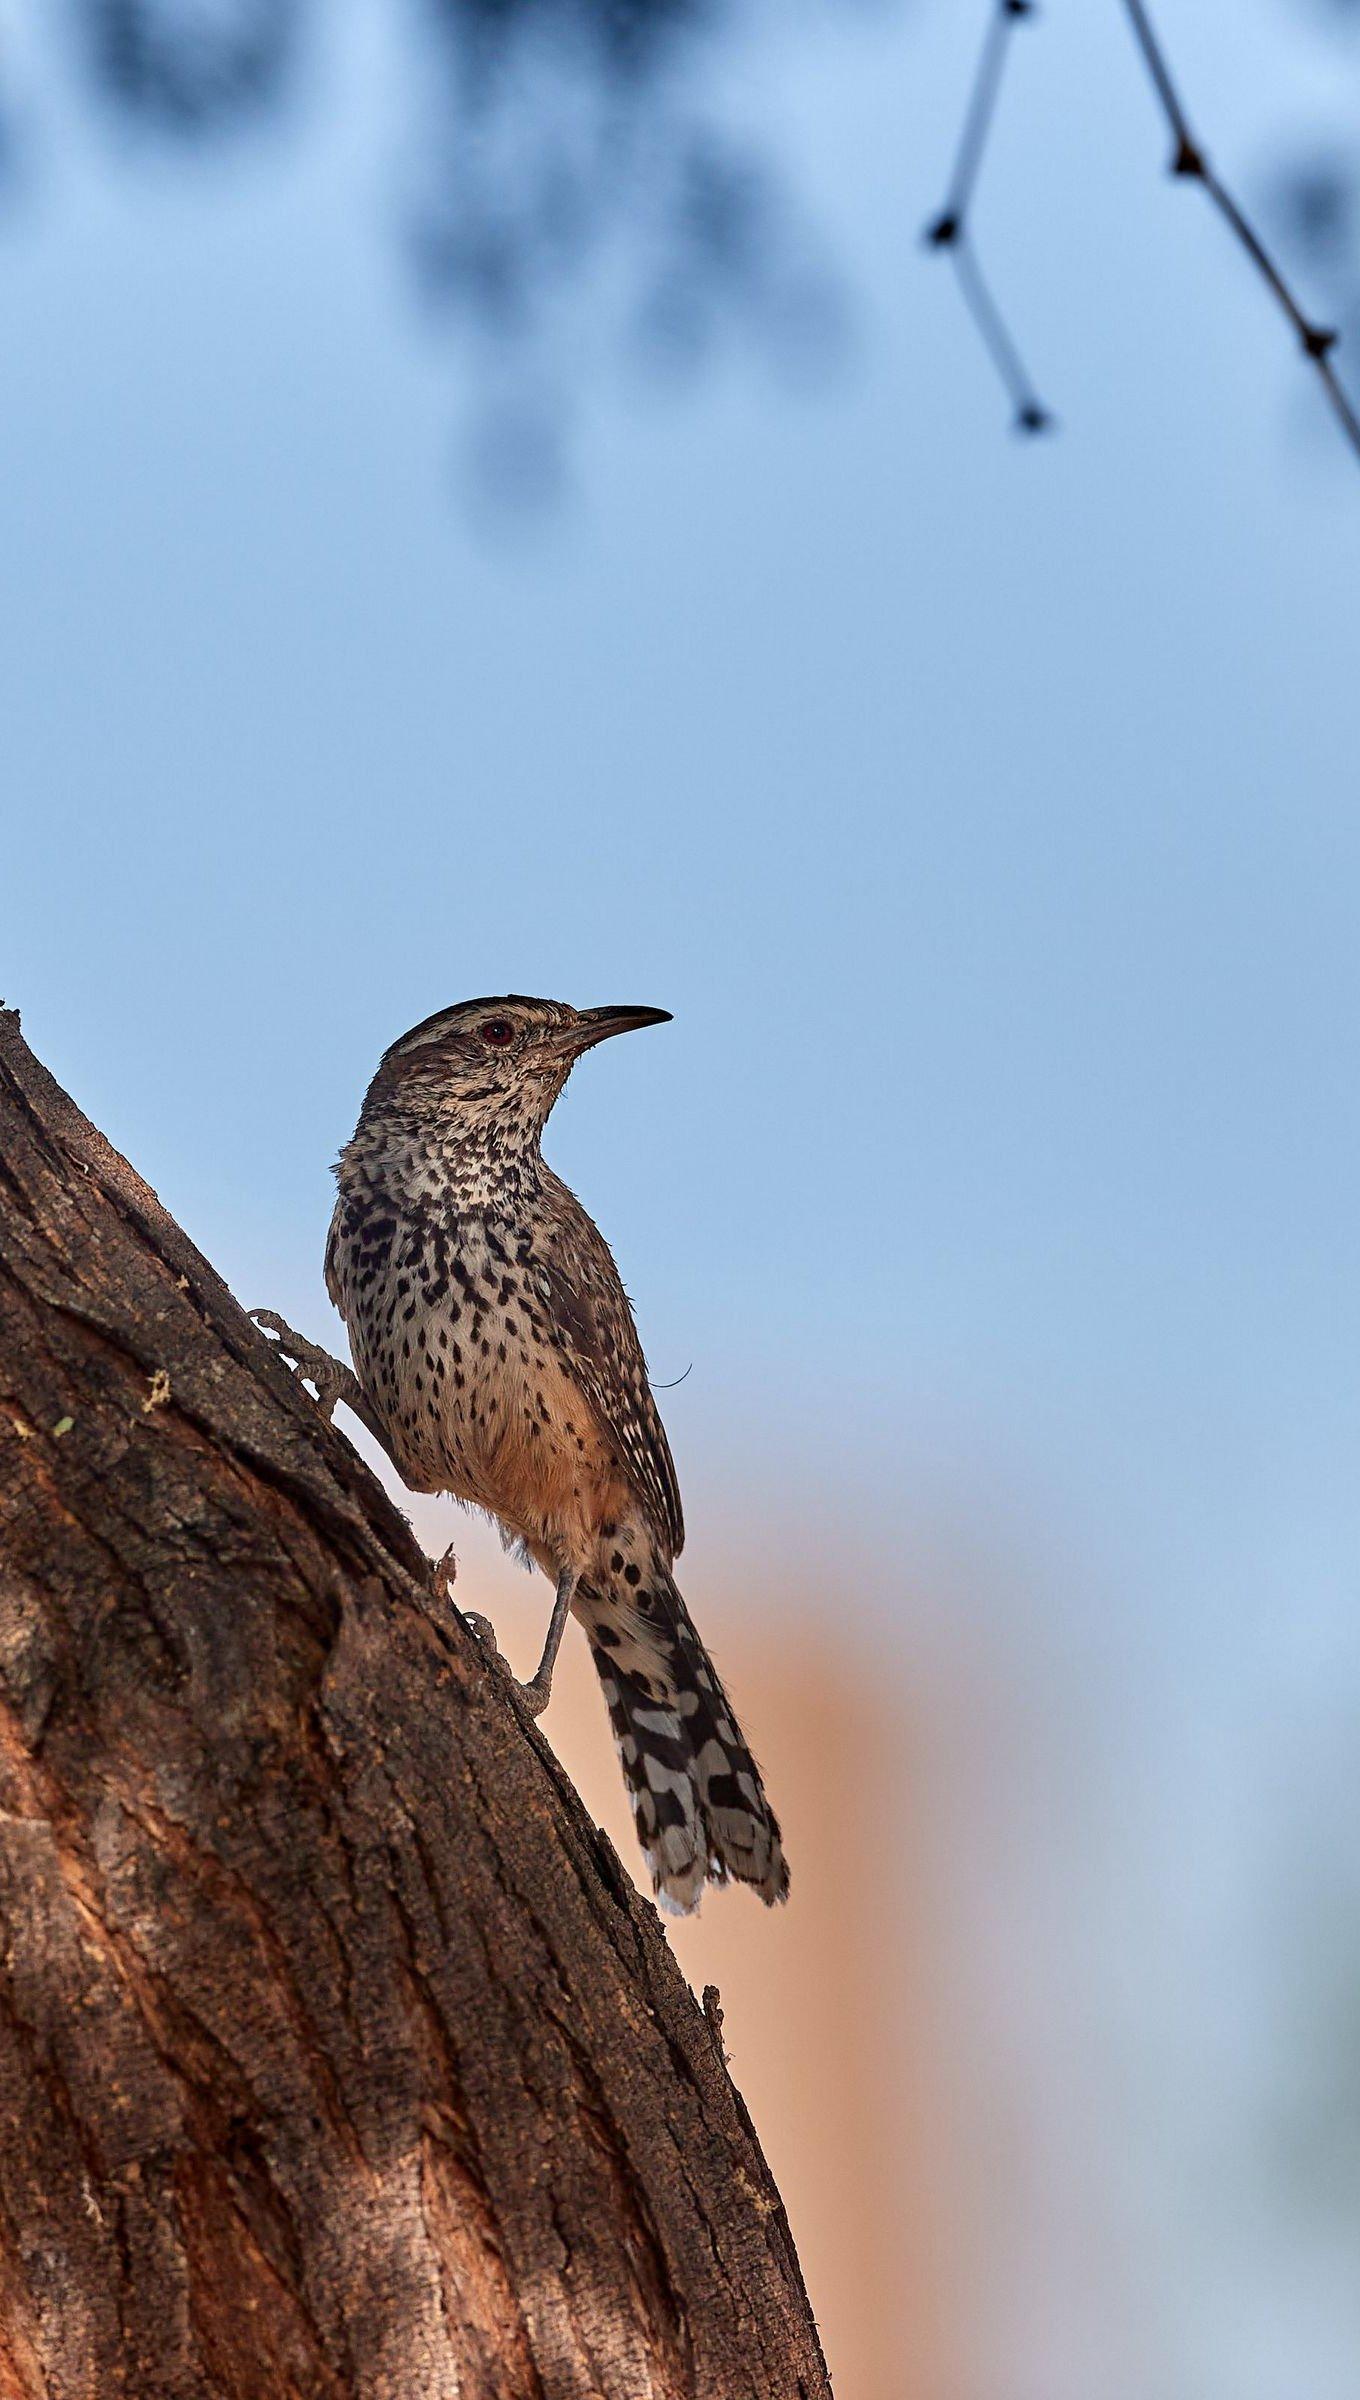 Wallpaper Thrush bird on tree Vertical